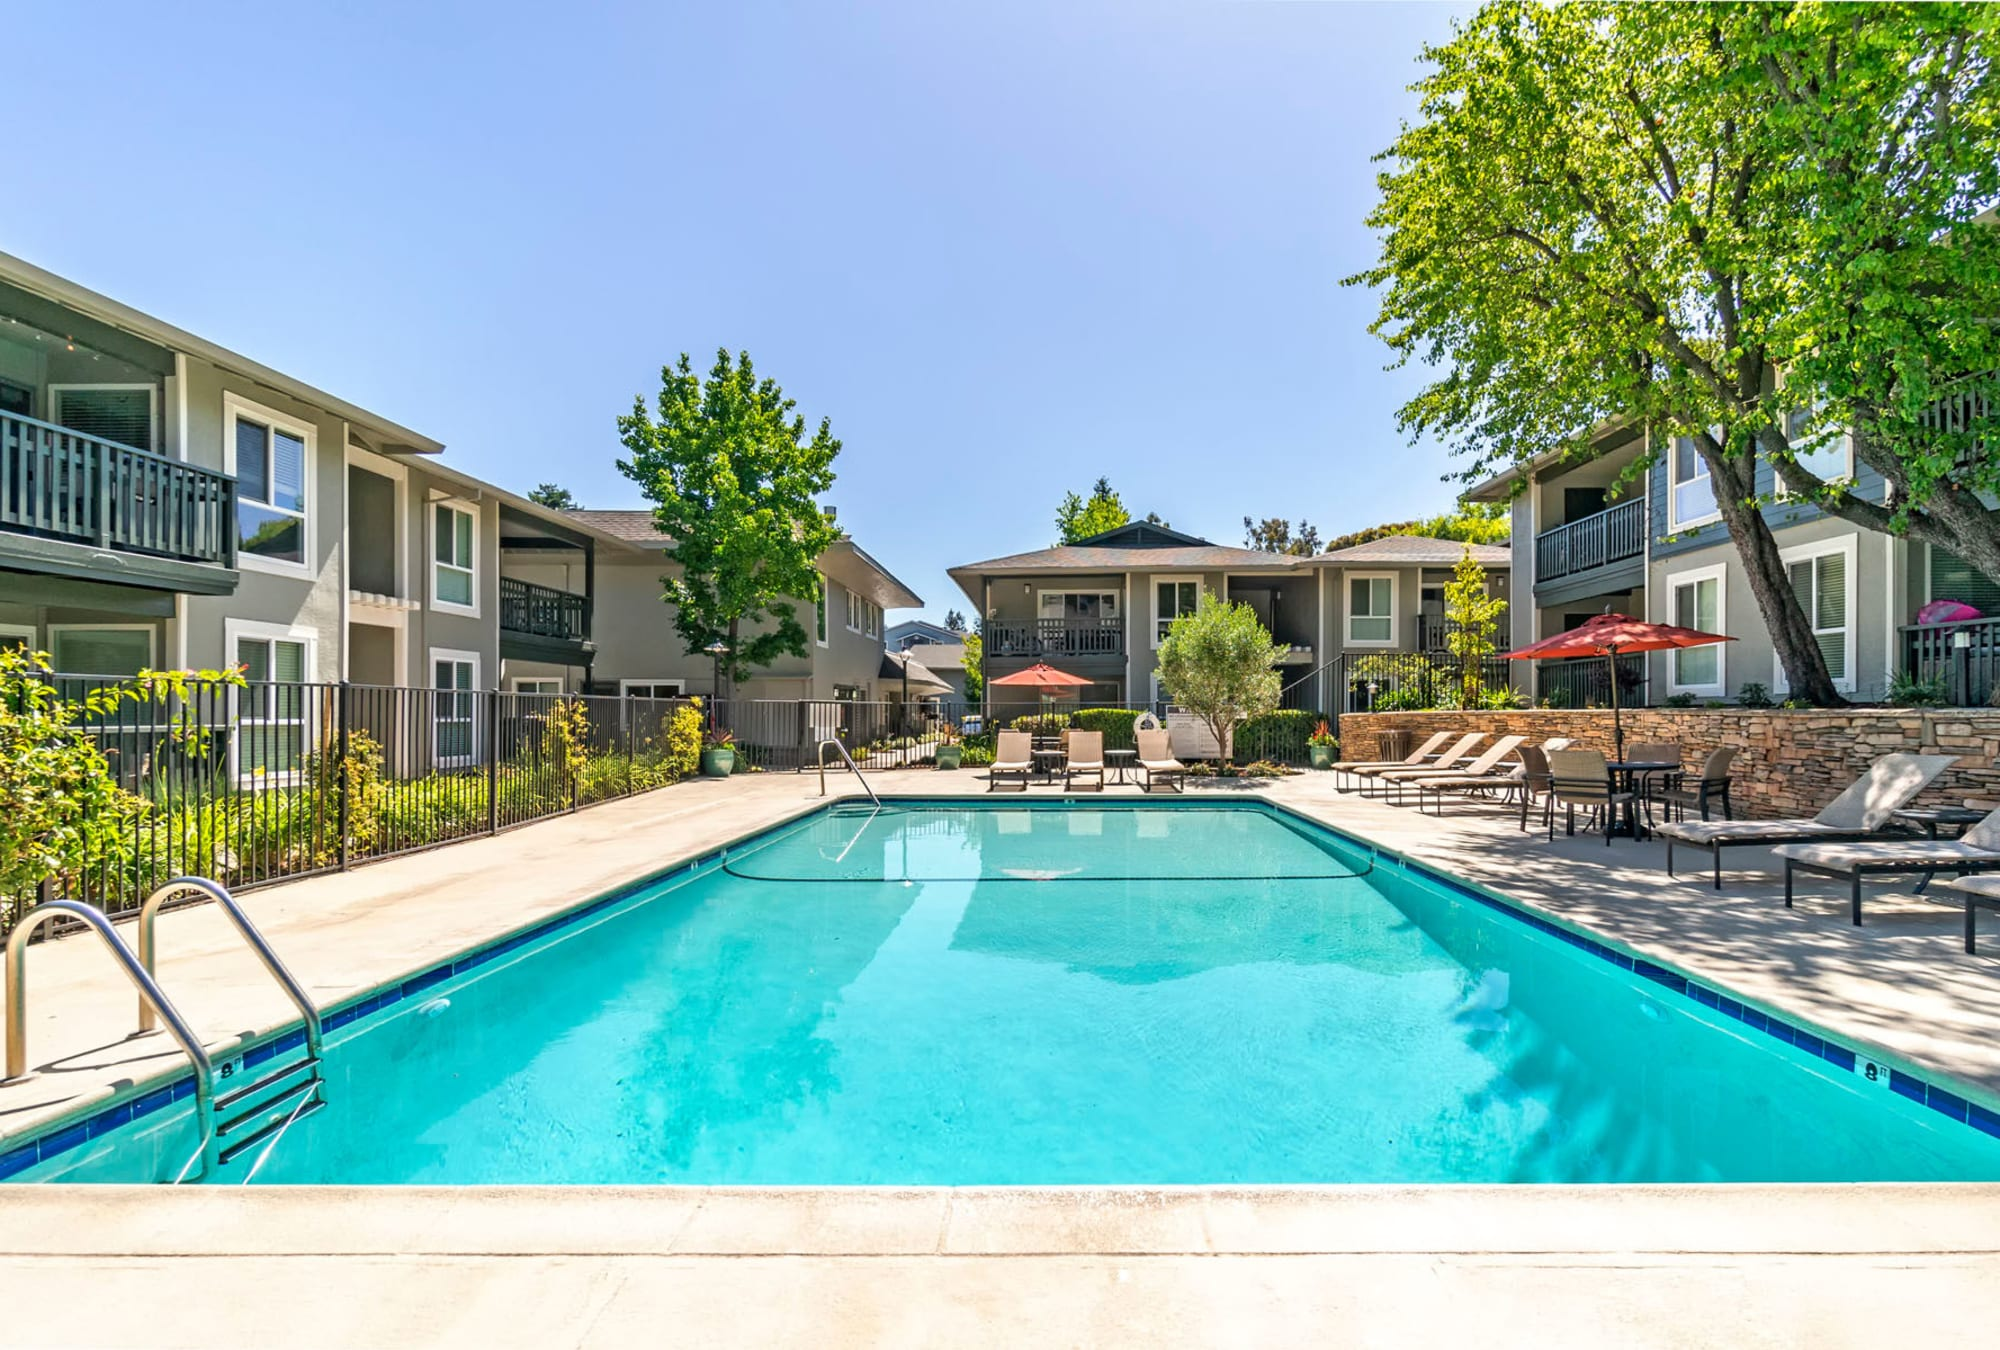 Lounge chairs near the pool at Pleasanton Glen Apartment Homes in Pleasanton, California